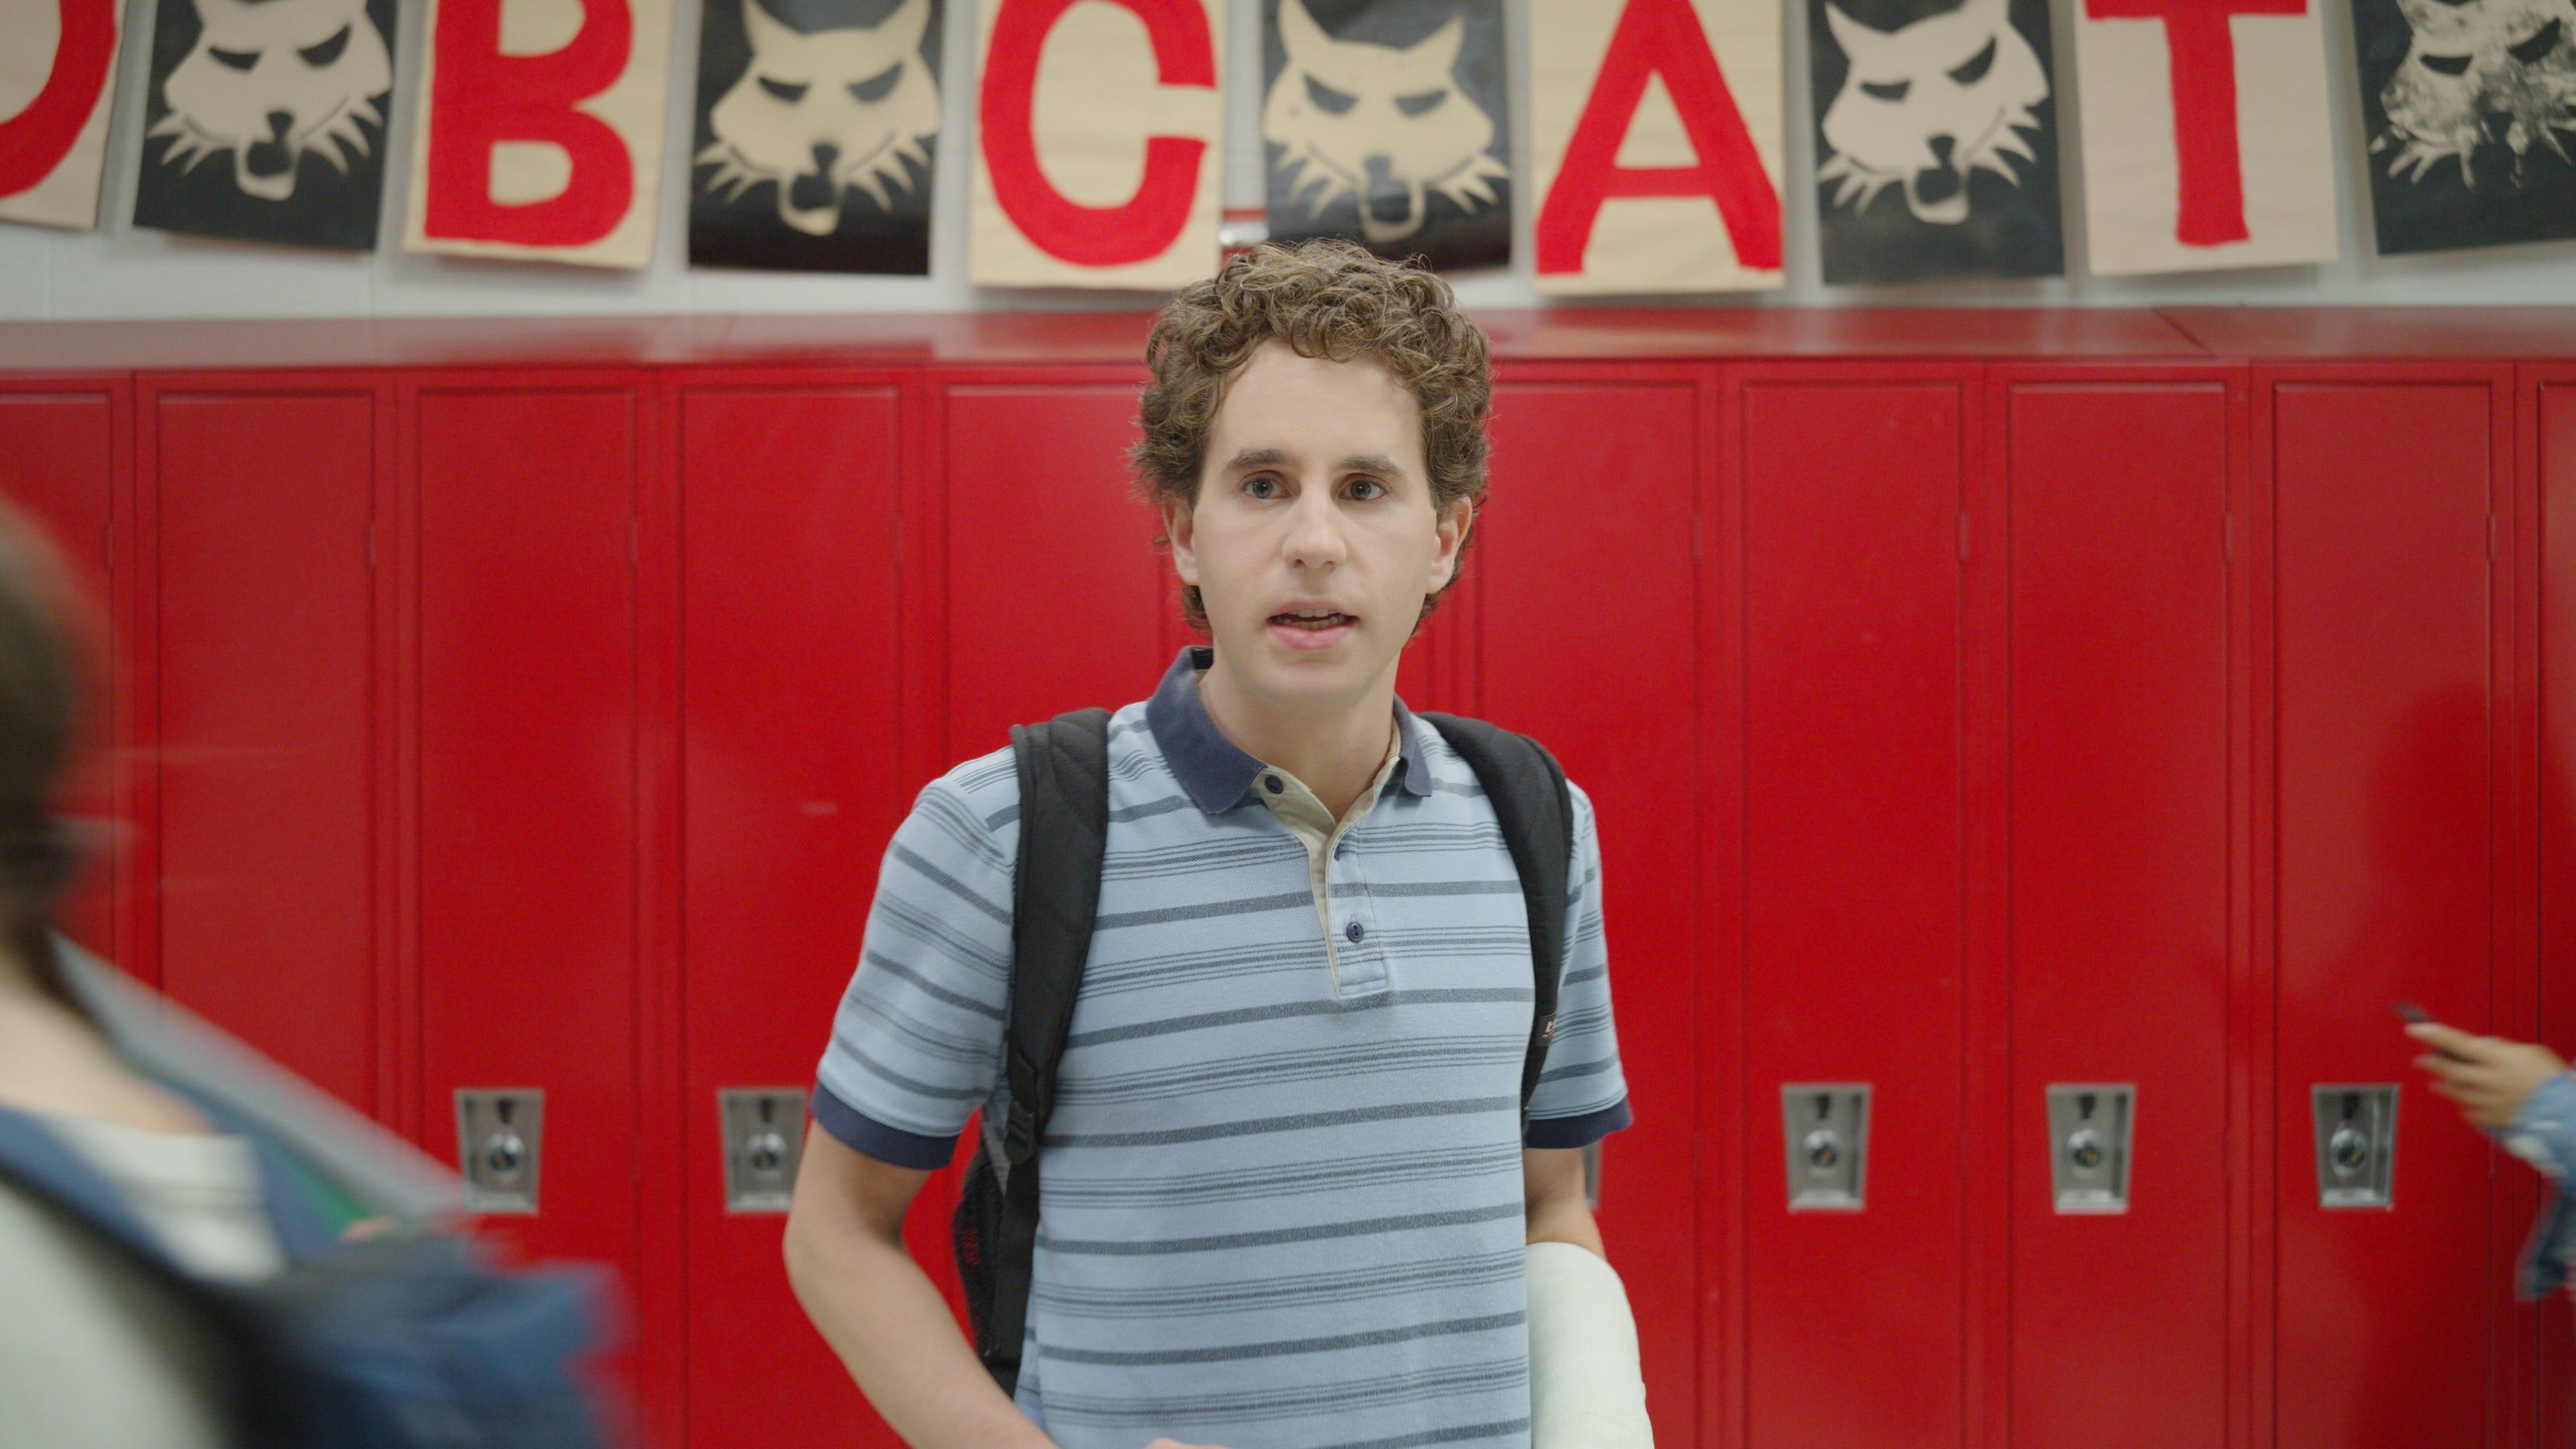 Dear Evan Hansen' movie stars a too-old Ben Platt. That's a problem